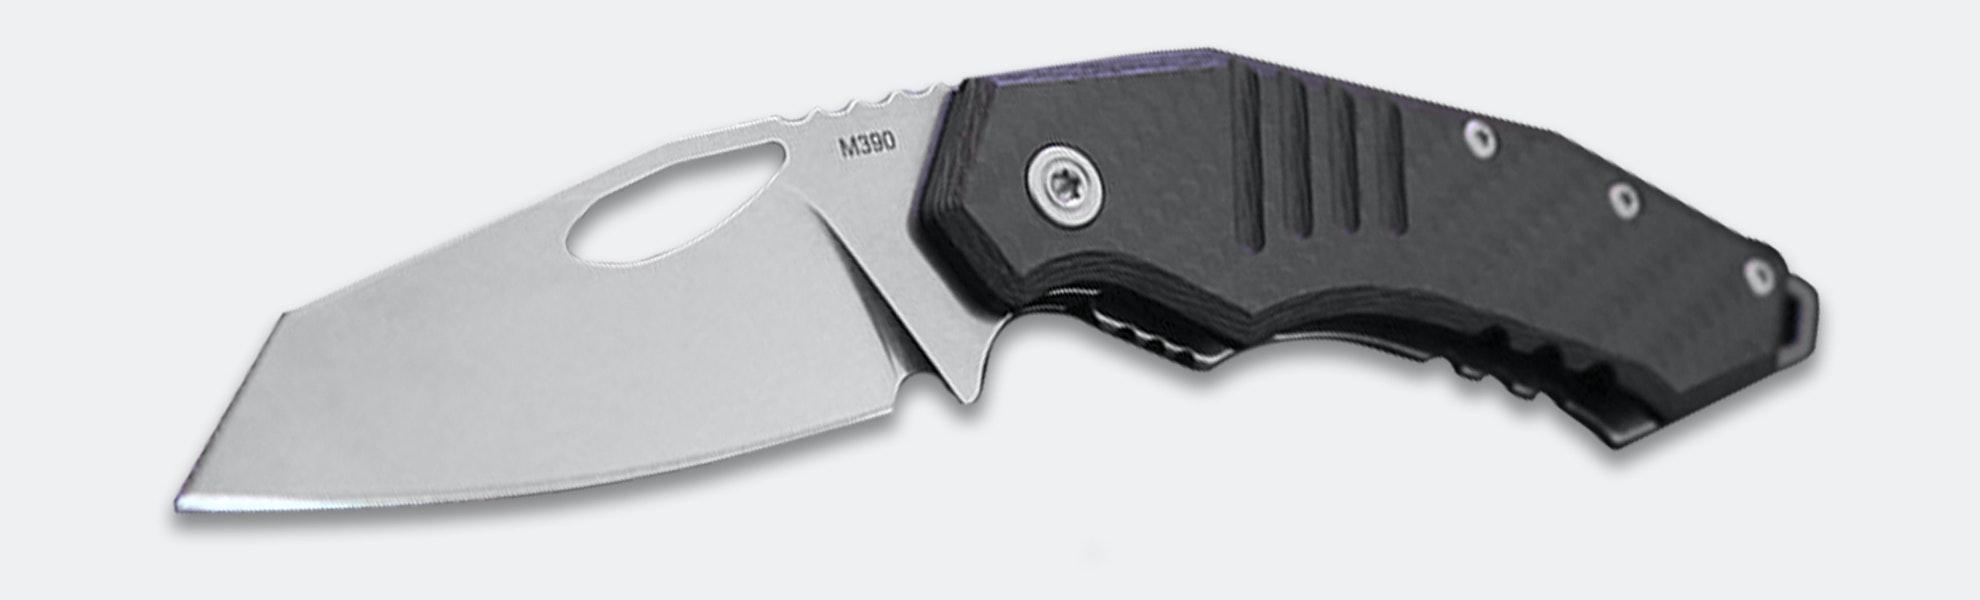 Raidops Blue Shark M390 Folding Knife